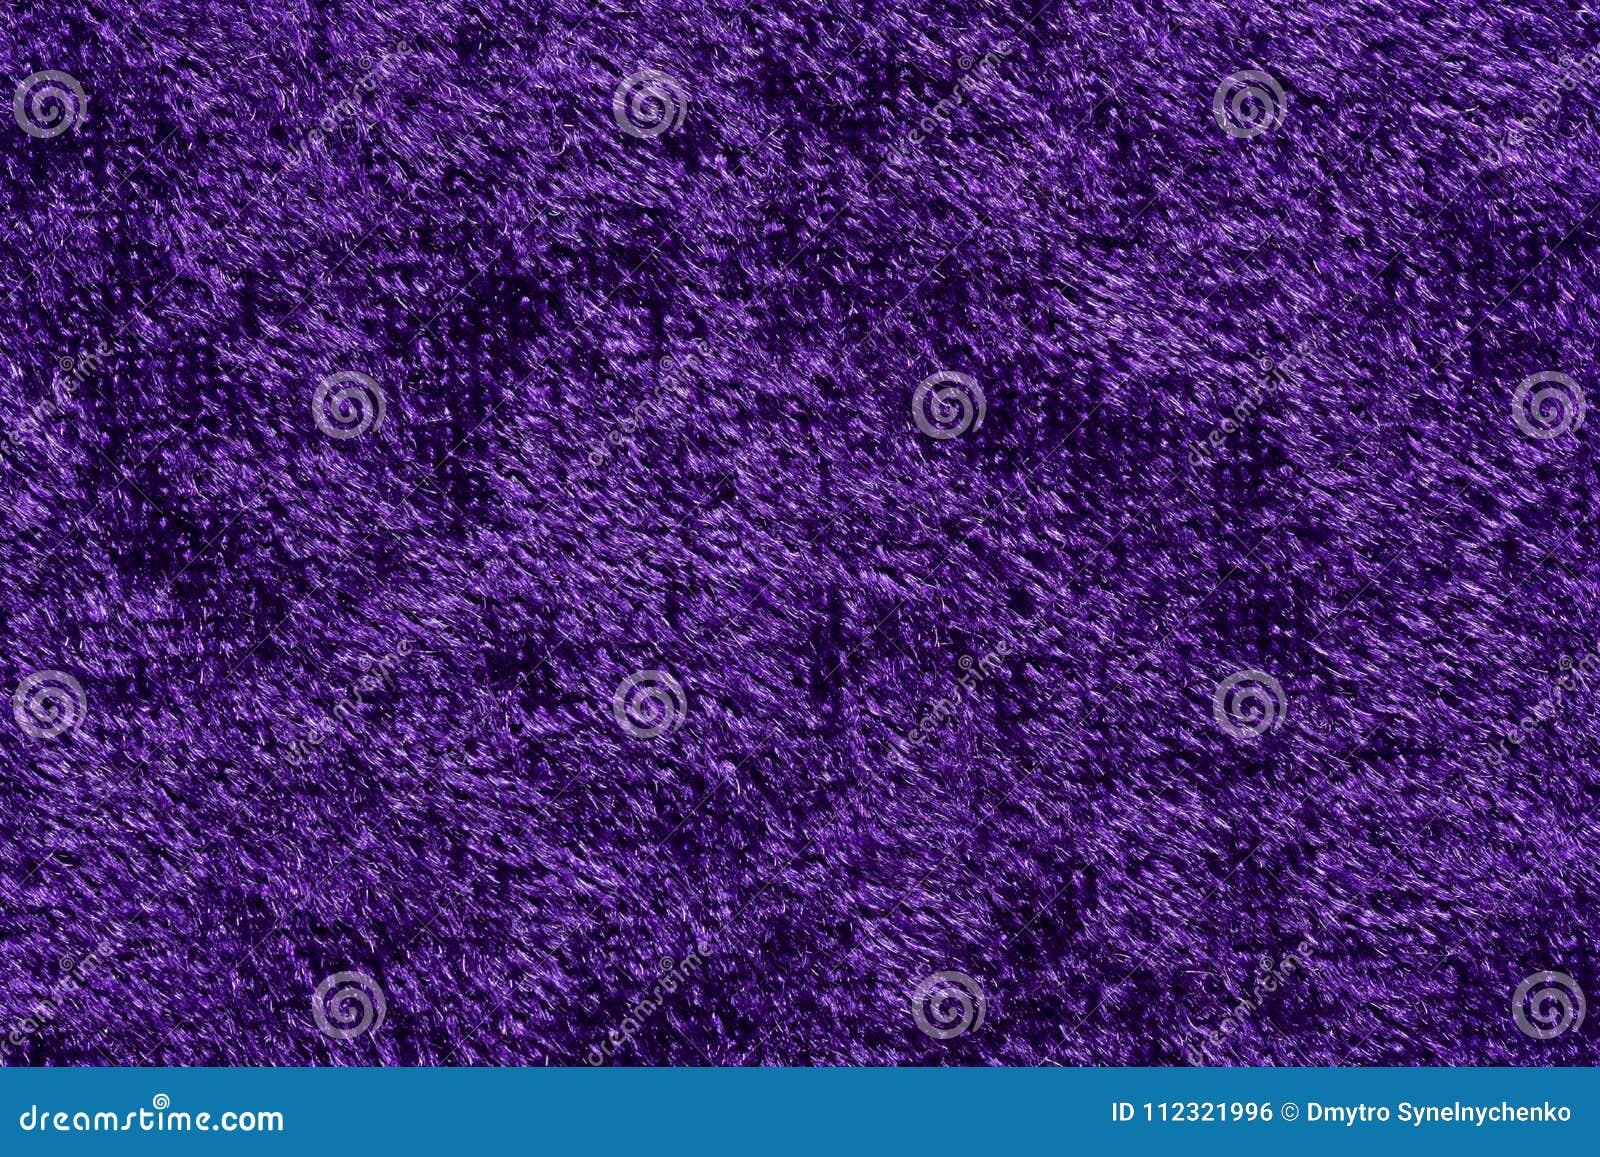 Elegant Fabric Texture In Contrast Violet Tone Stock Photo Image